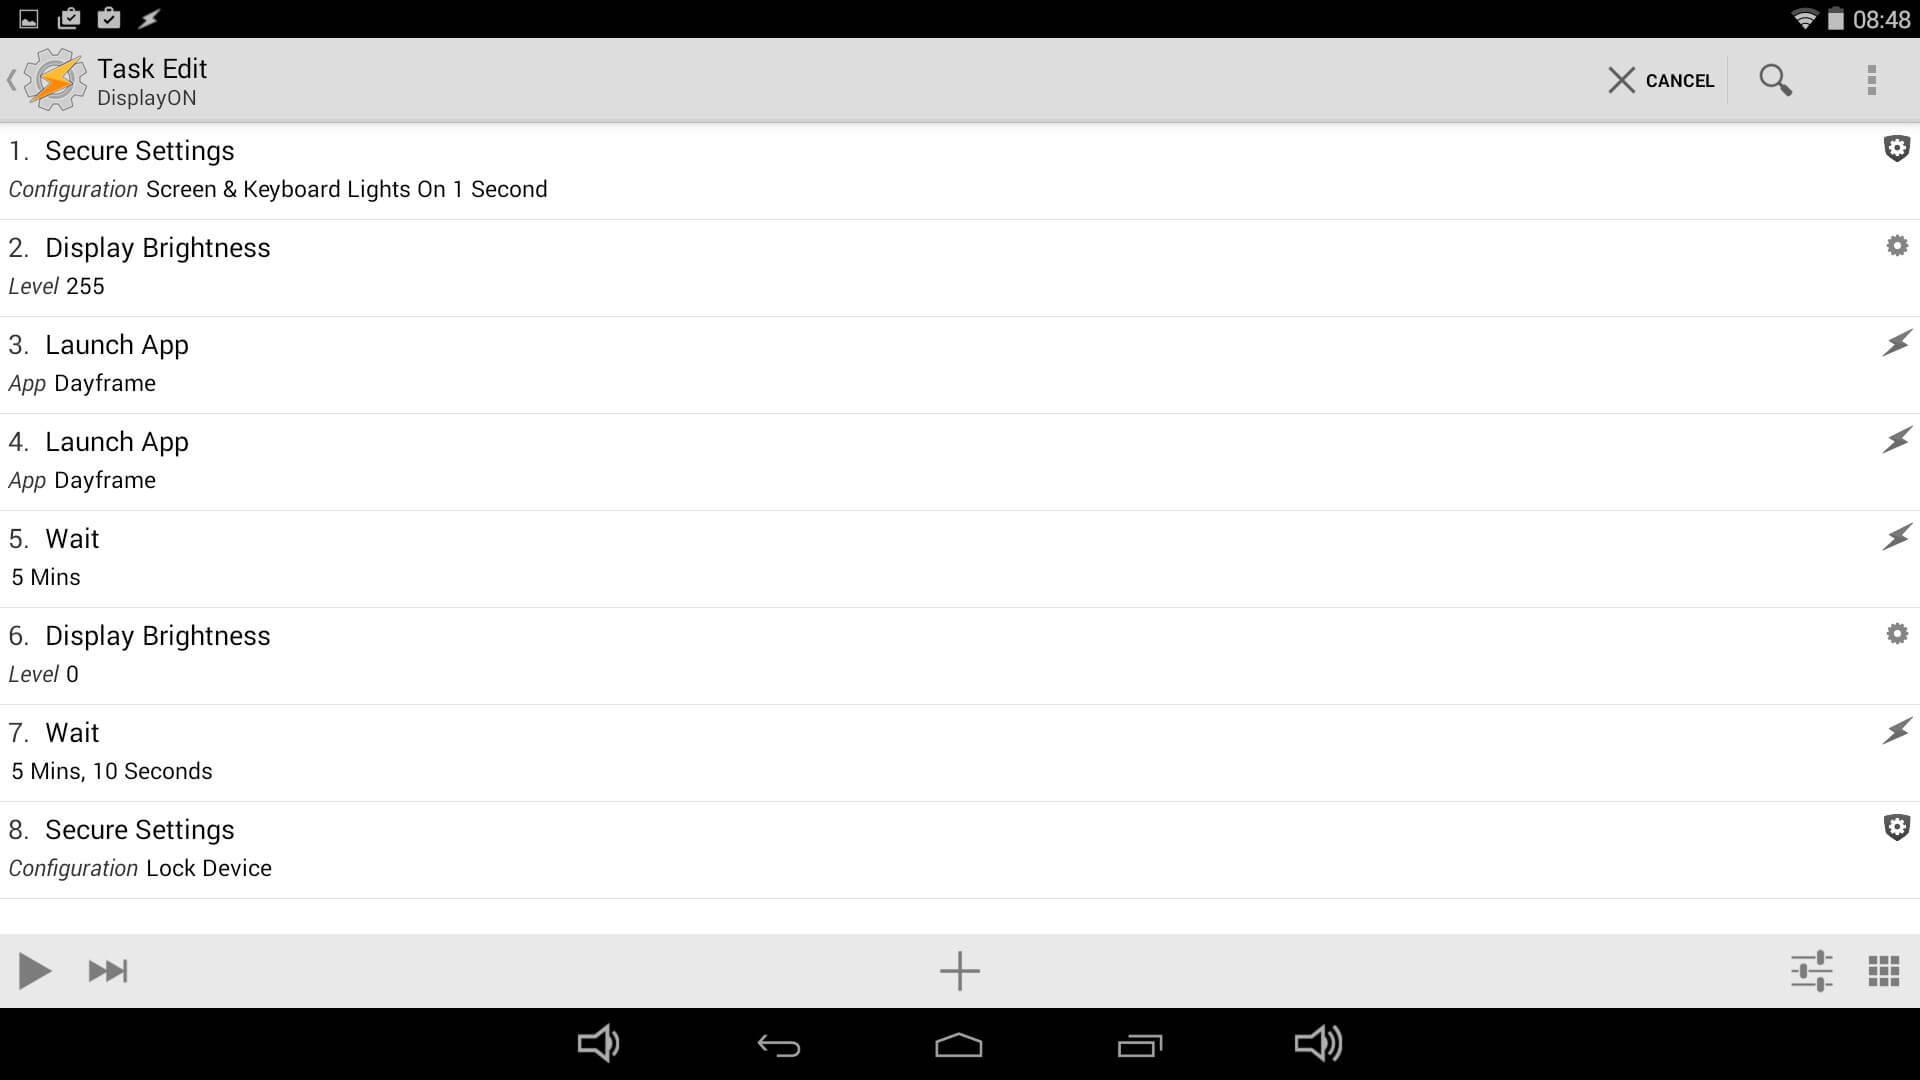 Android-Tablet als digitaler Bilderrahmen - mit Fotos aus dem ...